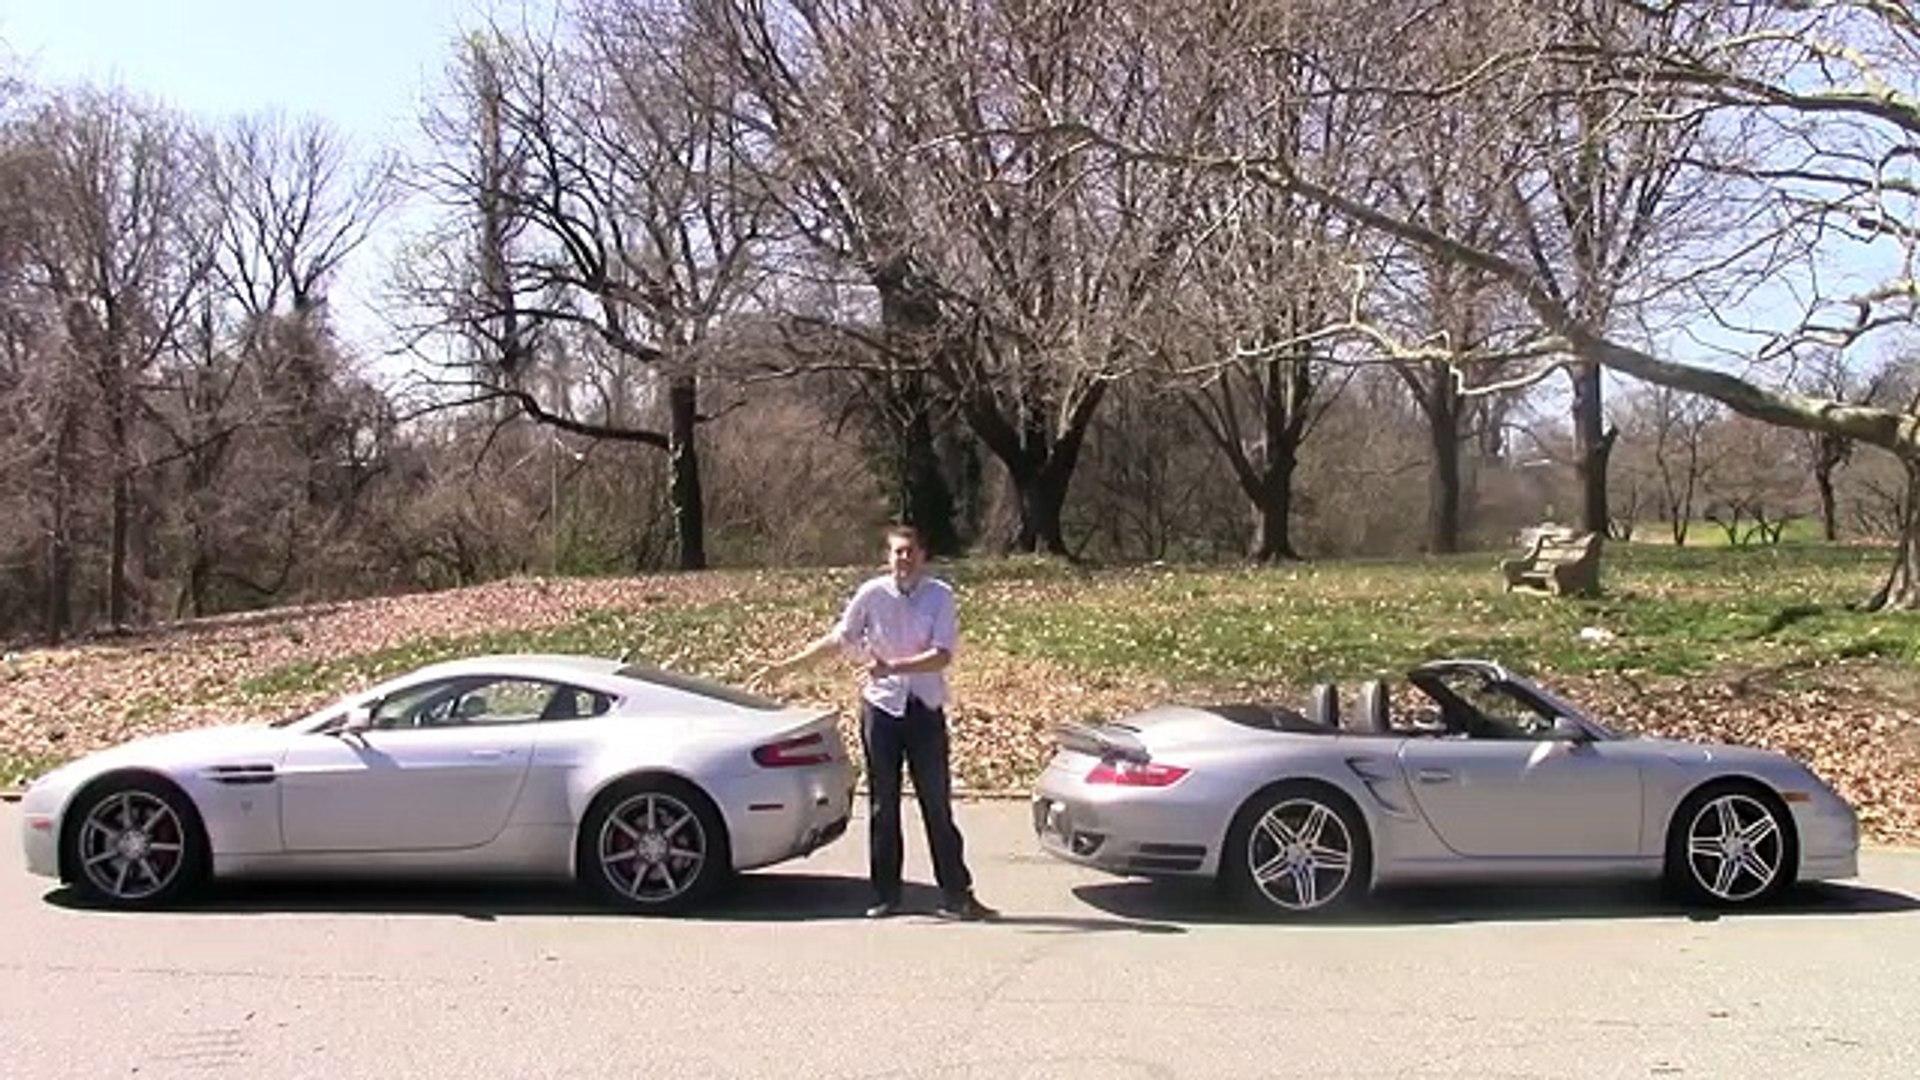 Aston Martin V8 Vantage Vs Audi R8 Vs Porsche 911 Turbo видео Dailymotion